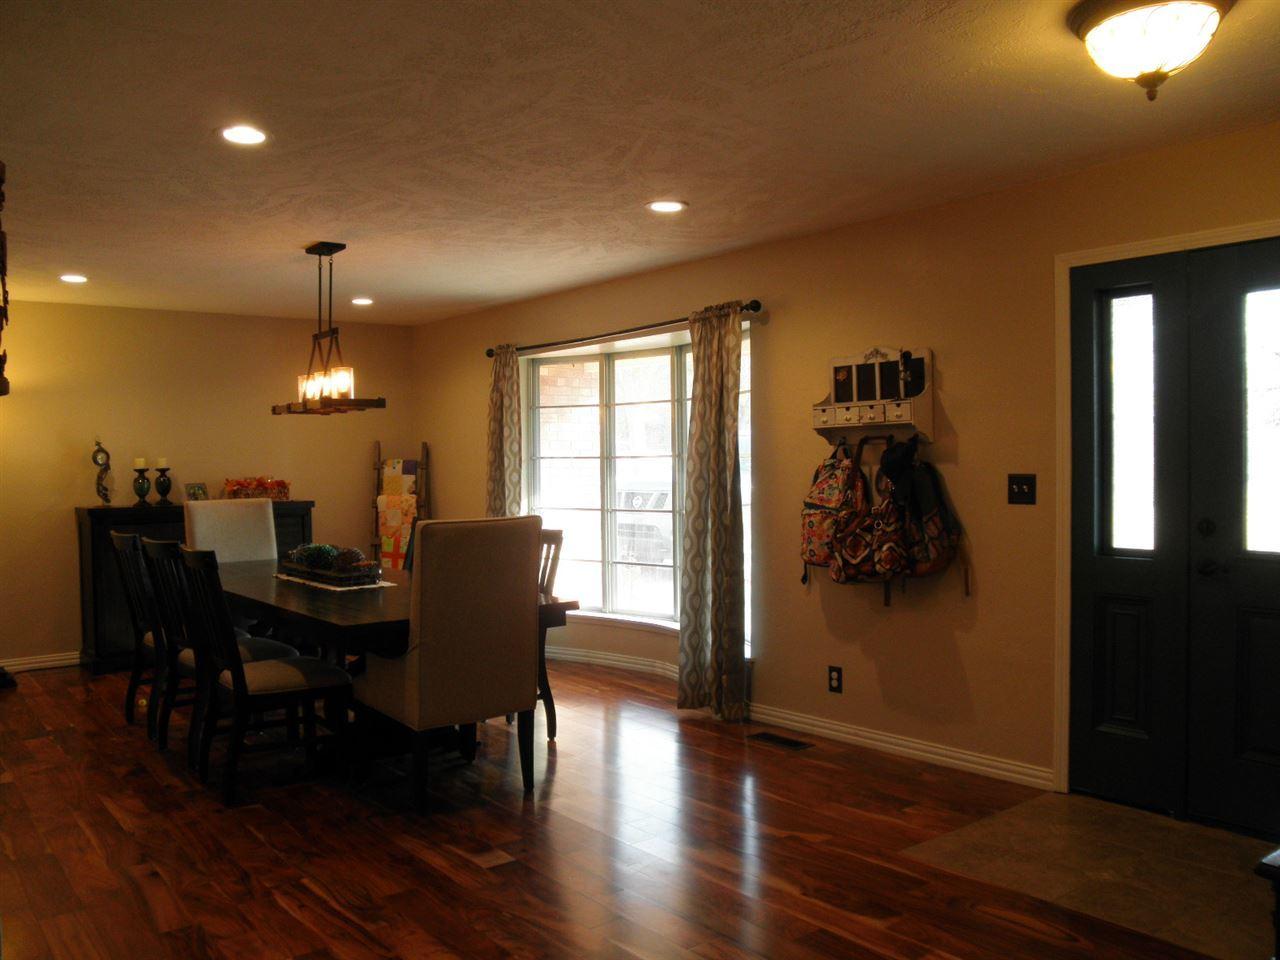 Sold Intraoffice W/MLS | 1504 Trio Lane  Ponca City, OK 74604 8